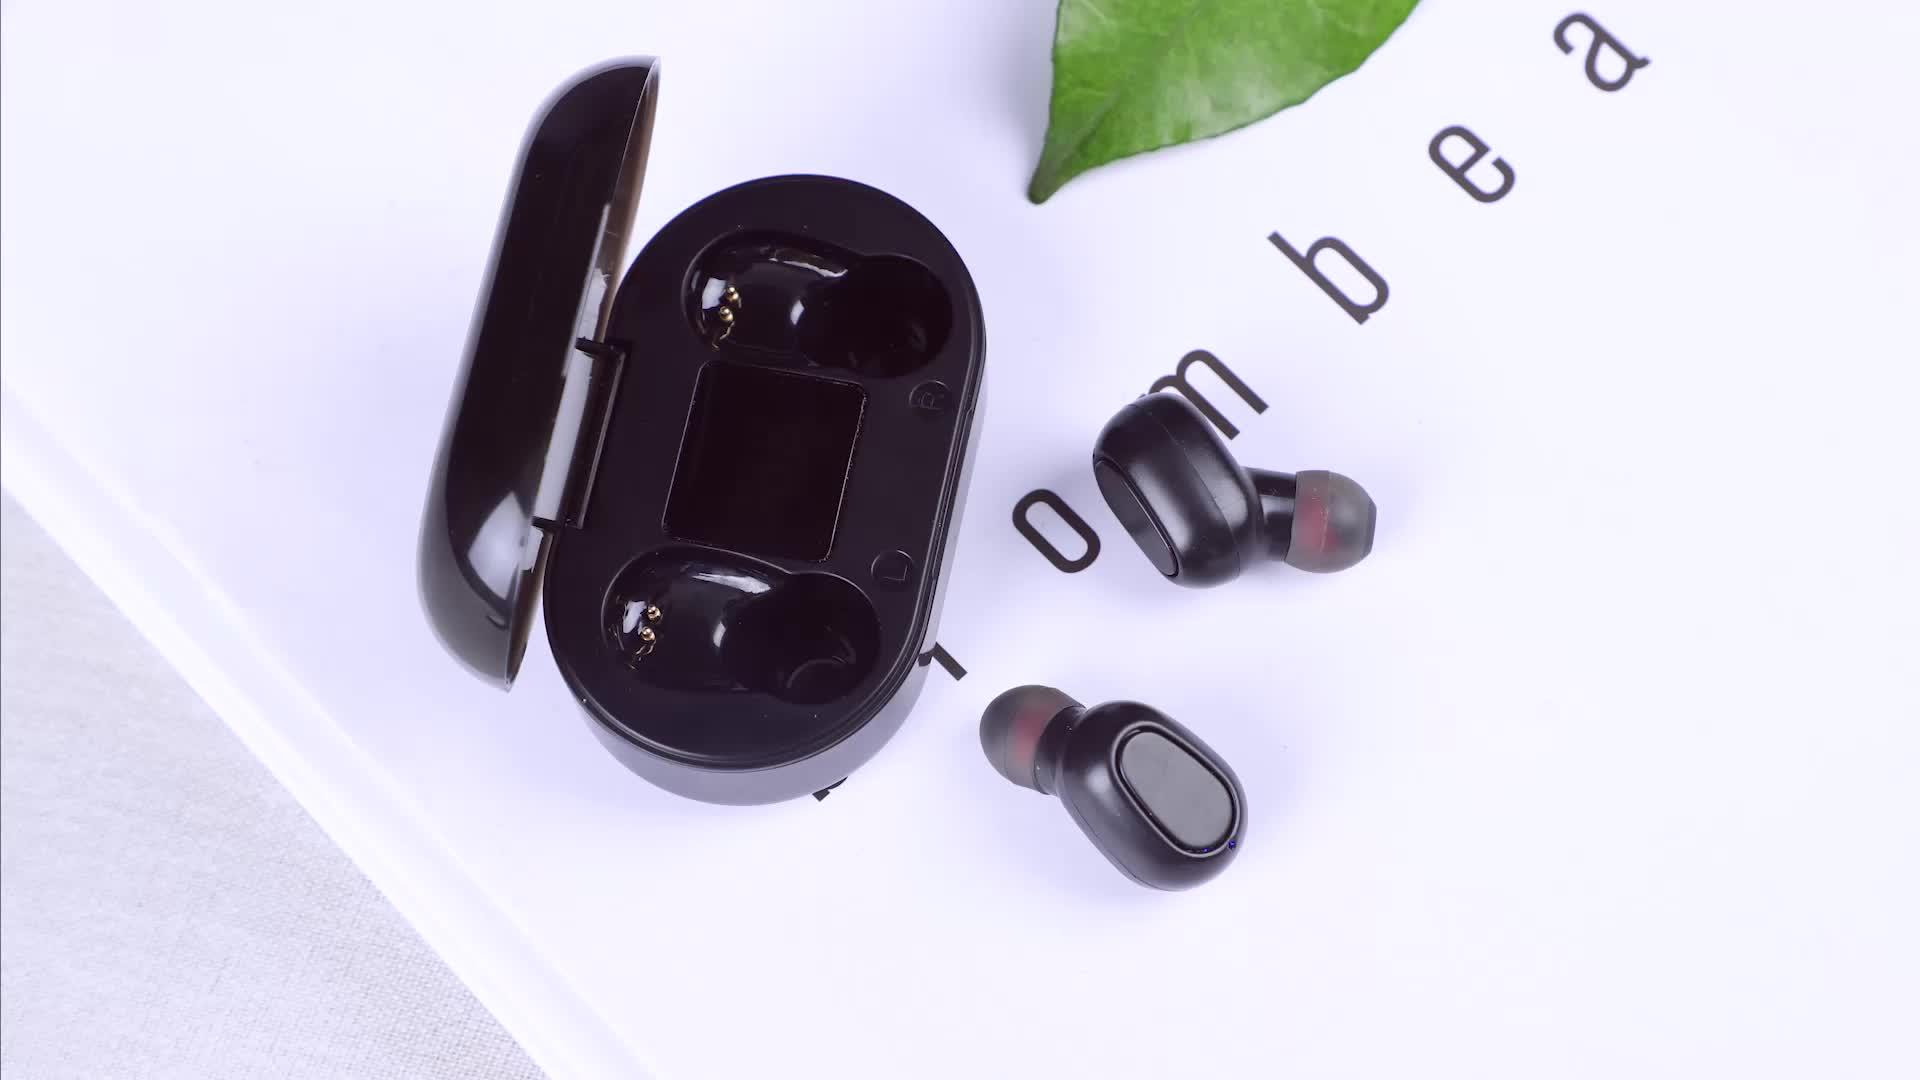 Freies Verschiffen TOPK TWS Drahtlose Bluetooth 5,0 Kopfhörer Ohrhörer Stereo Kopfhörer Freihändig in Ohr Telefon Headset